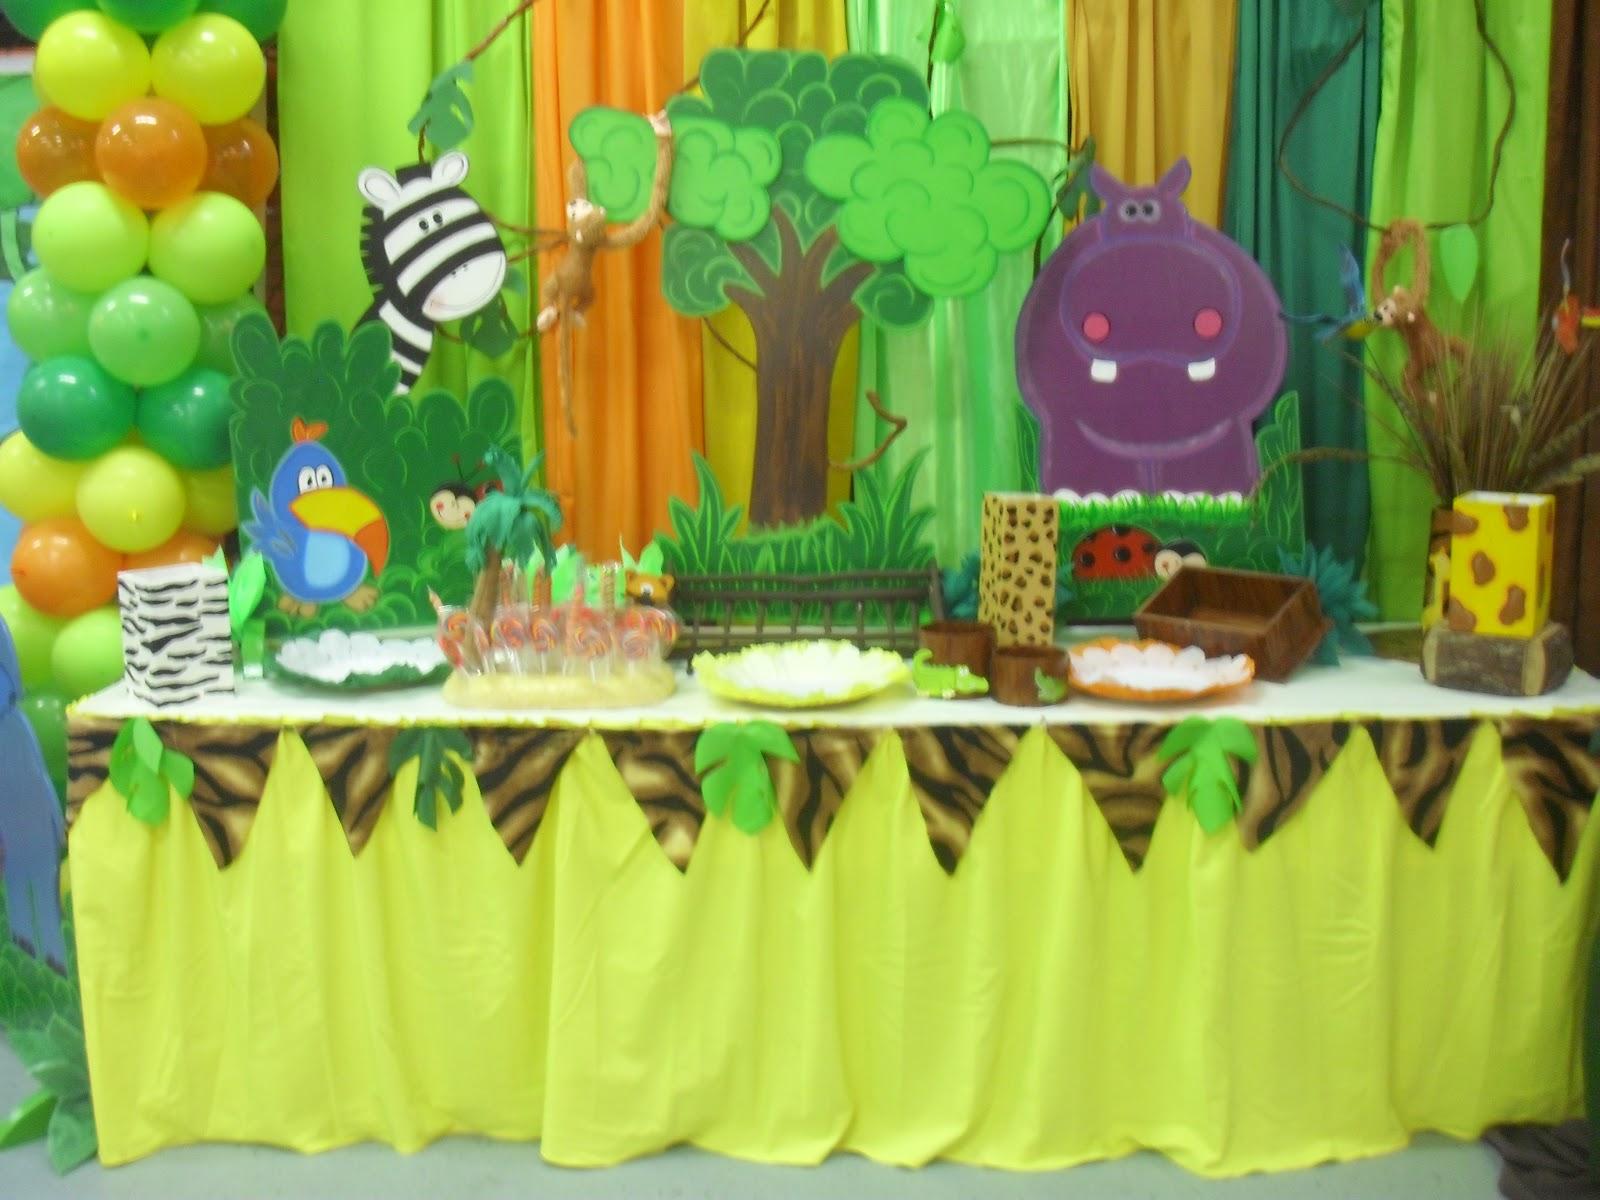 Ursula newman eventos fiesta infantil safari - Imagenes decoracion fiestas infantiles ...